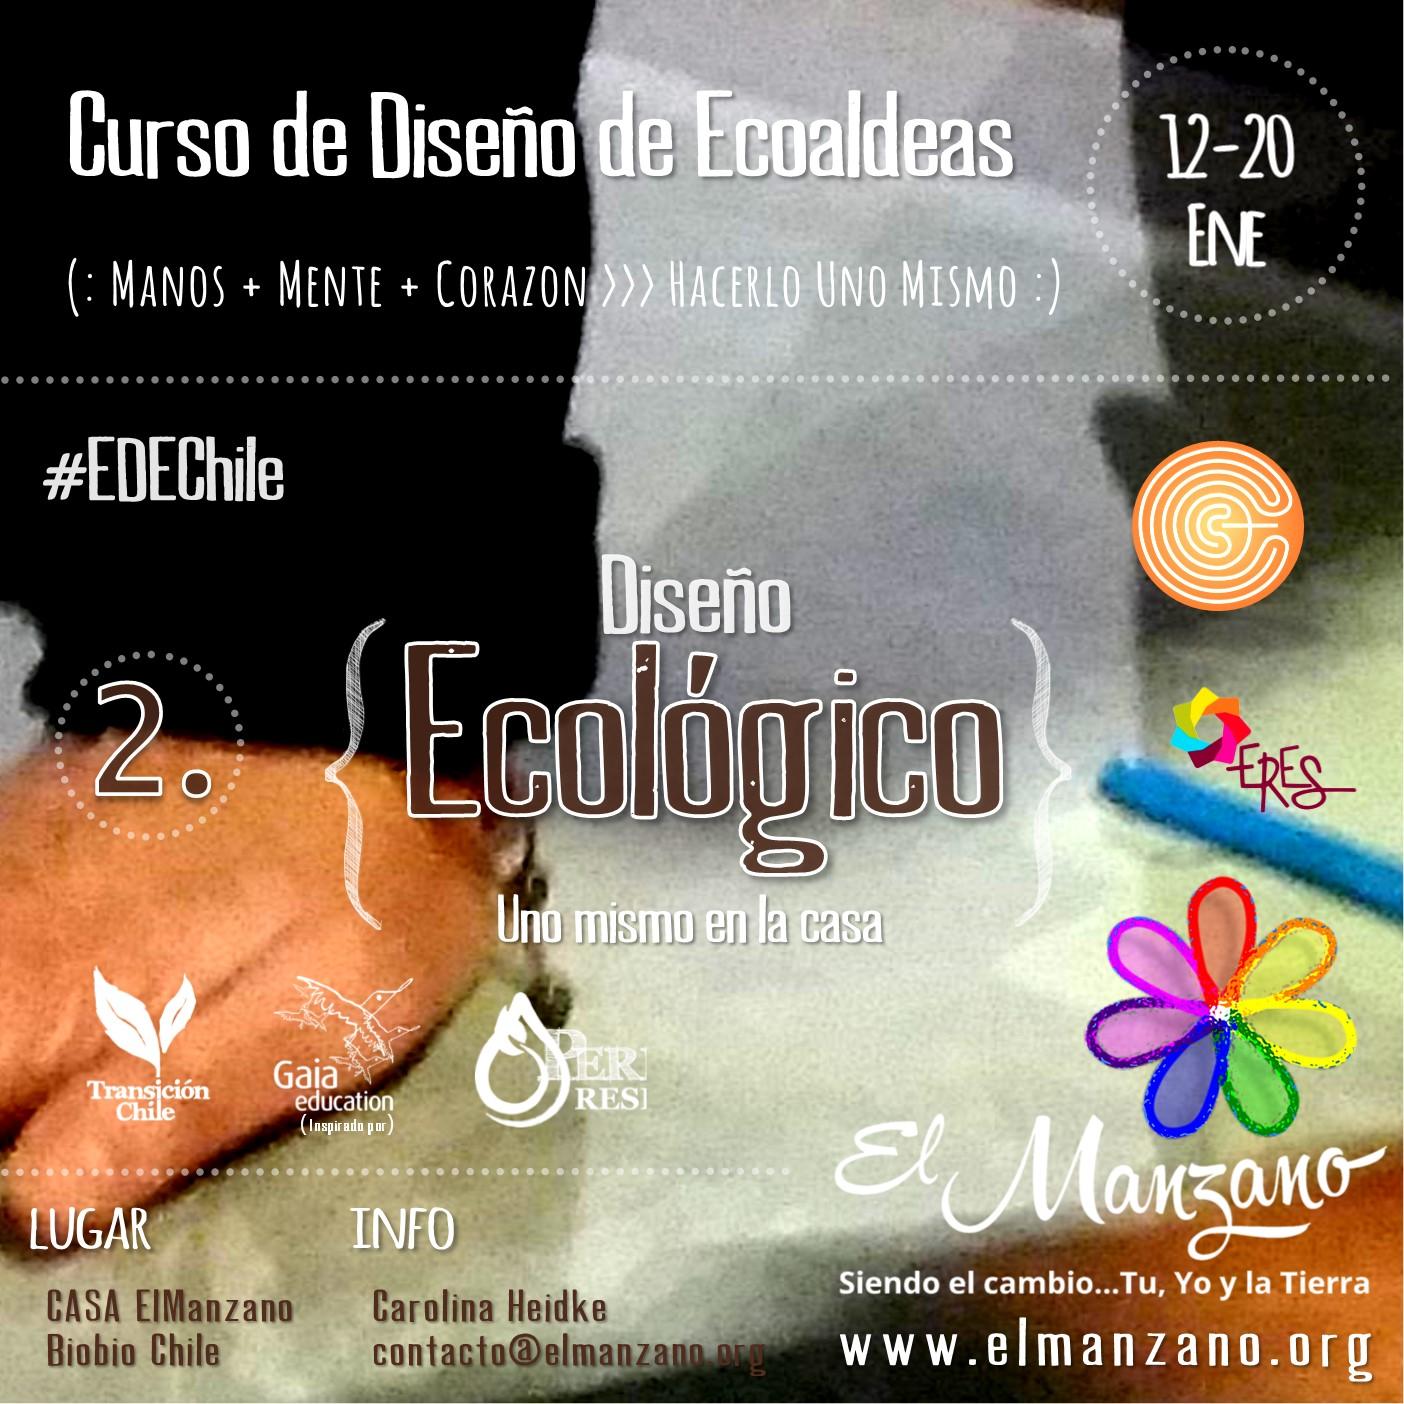 permacultura-diseno-regenerativo-ecoaldeas-el-manzano-chile-5-small